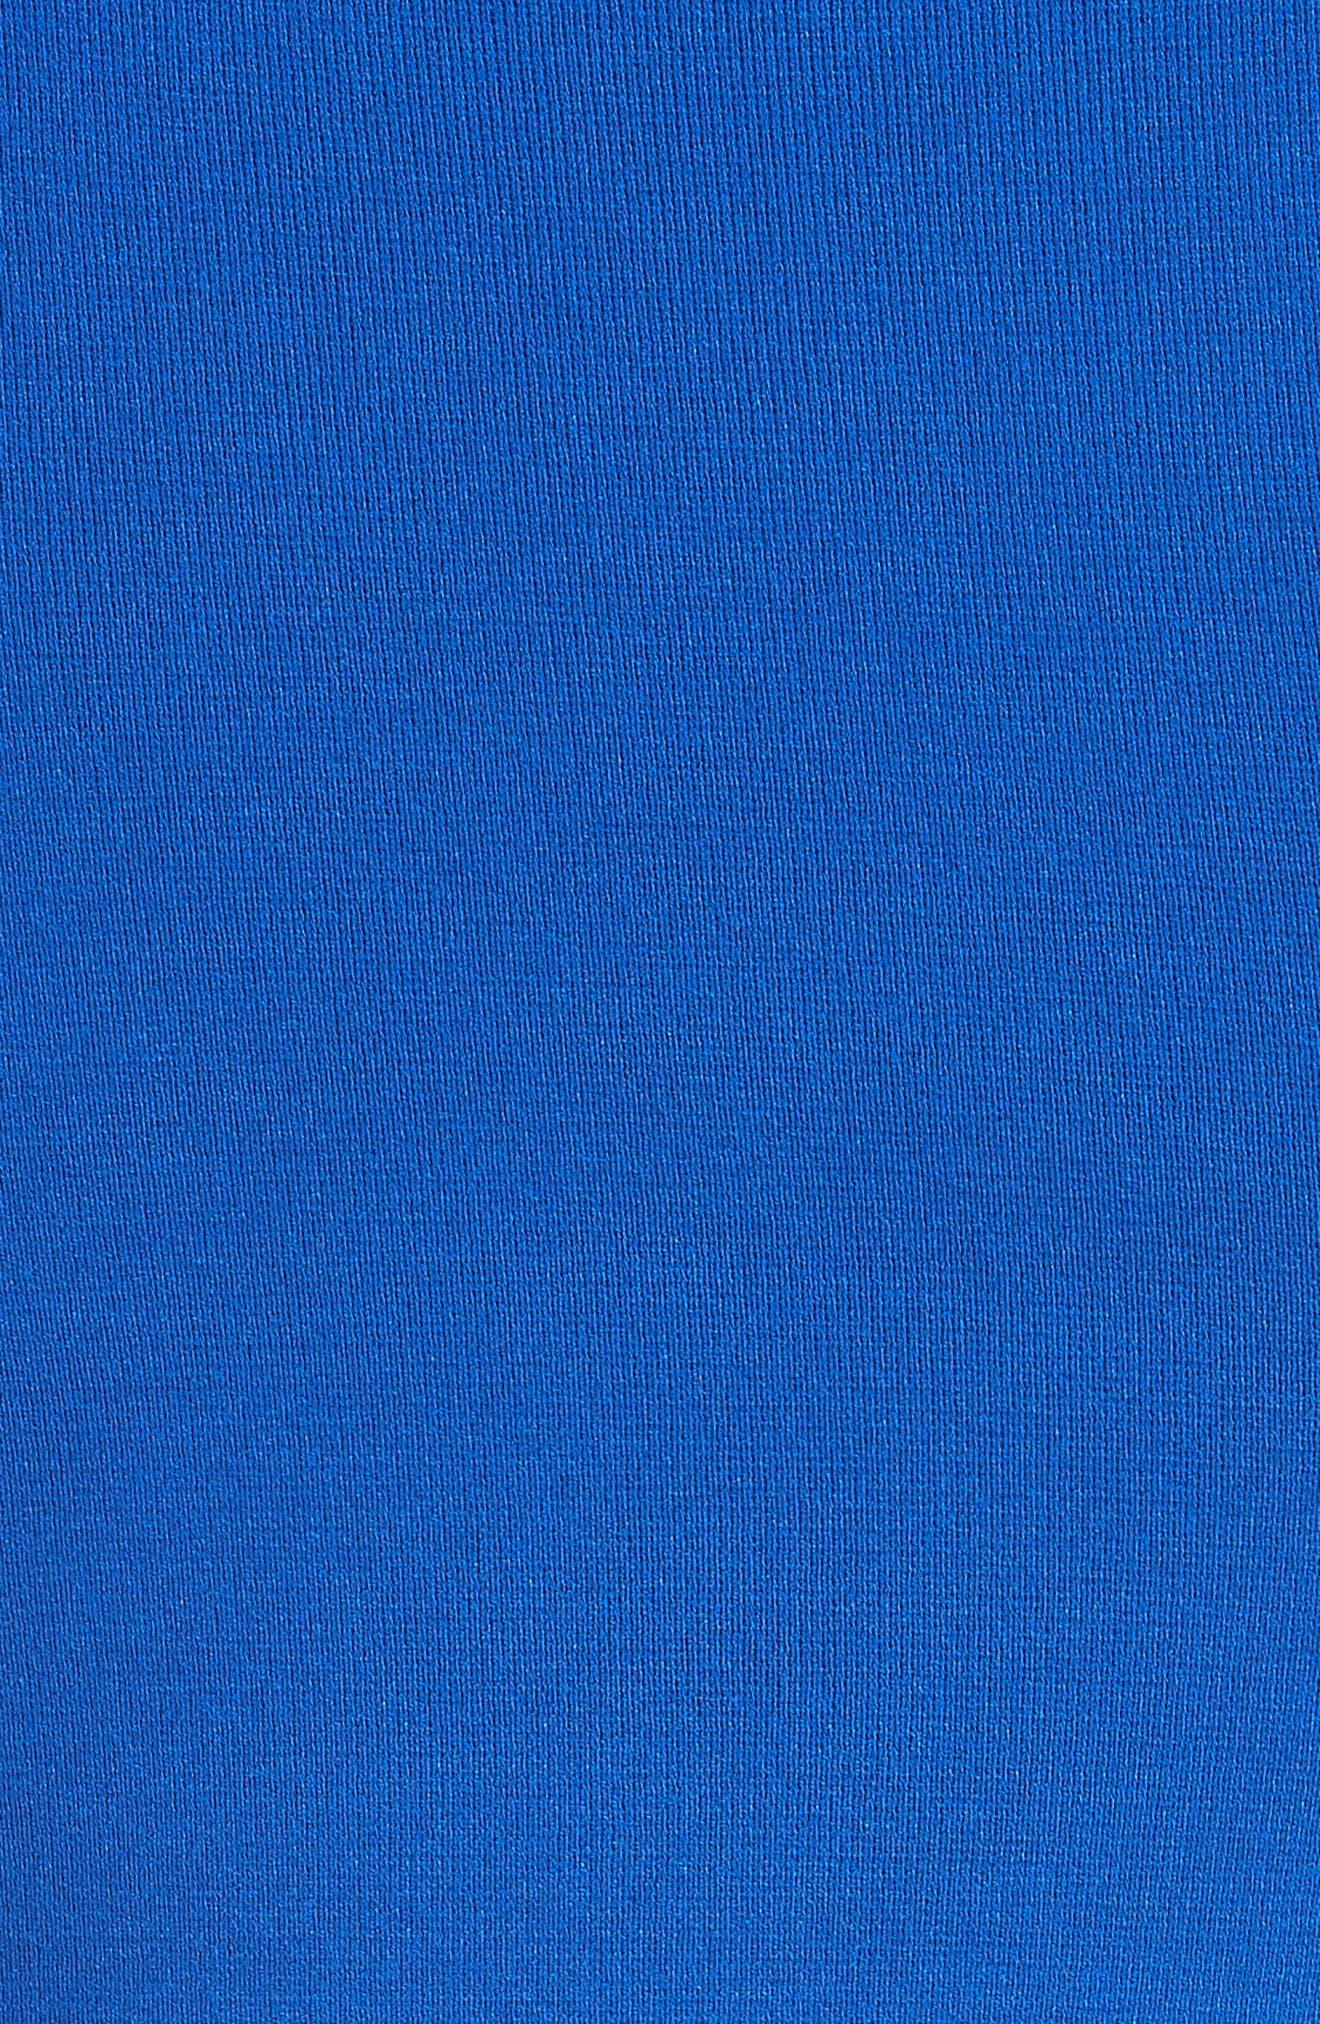 Alternate Image 5  - Versace Collection Contrast Stitch Knit Dress